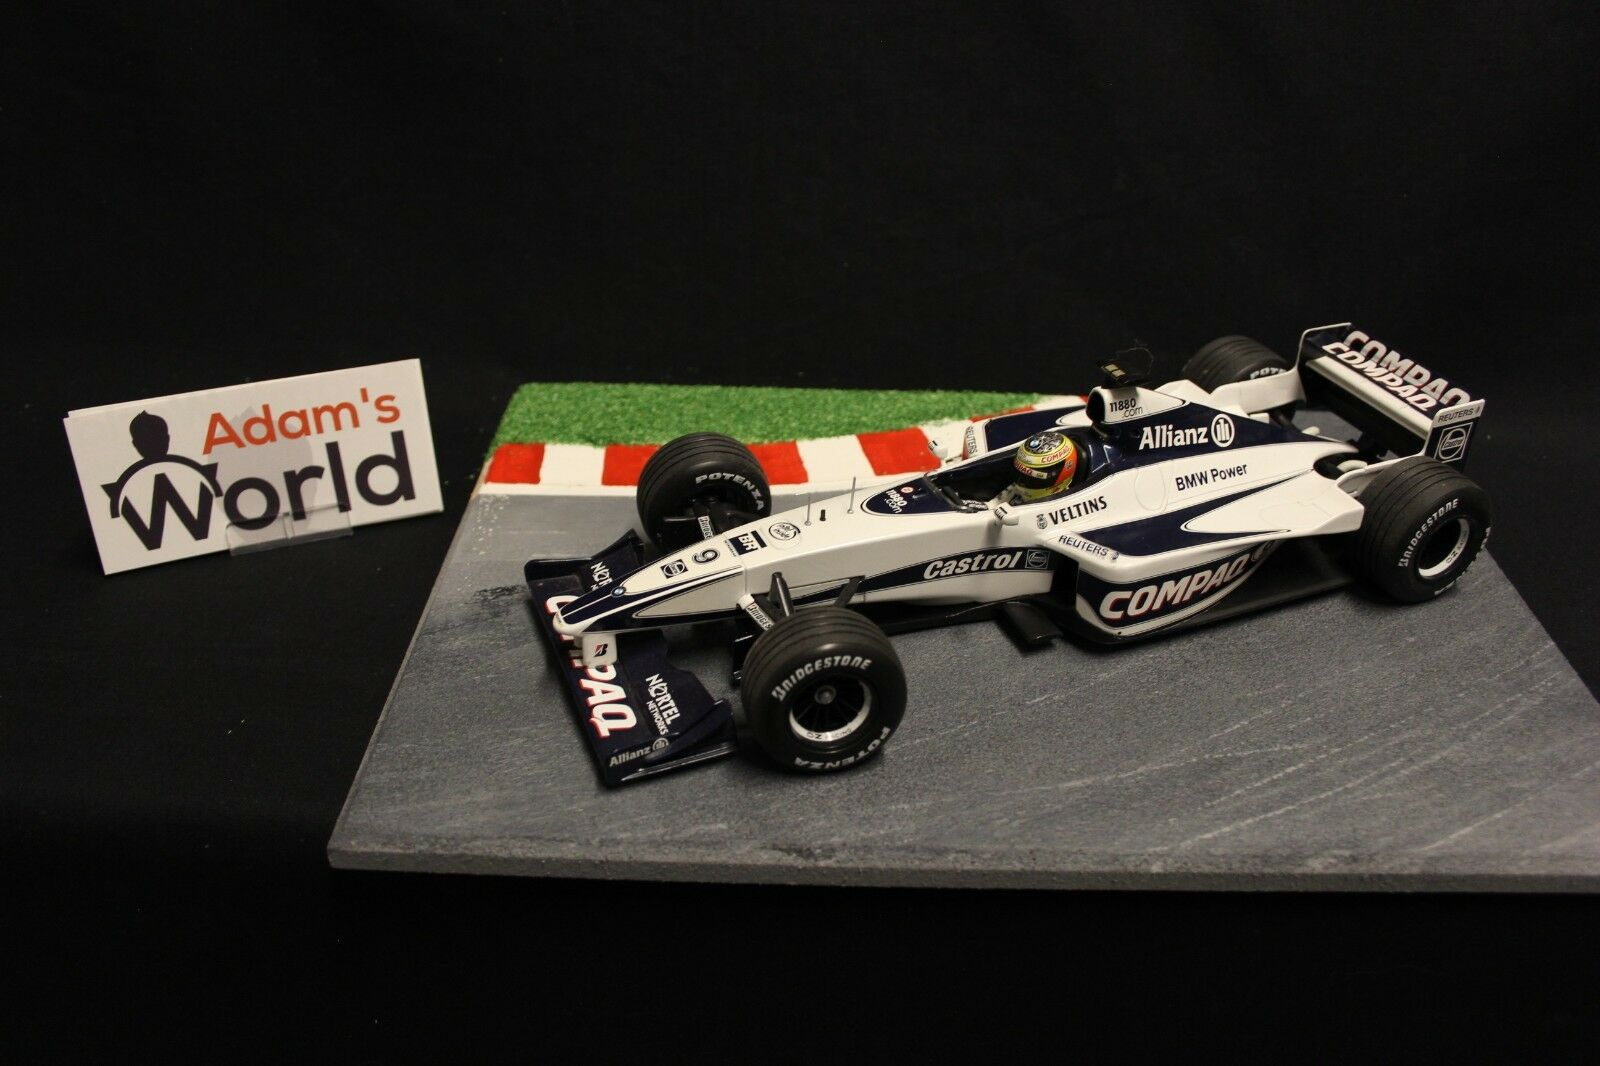 Minichamps Williams BMW FW22 2000 1 18 Ralf Schumacher (GER) (GER) (GER) (F1NB) 37afe8